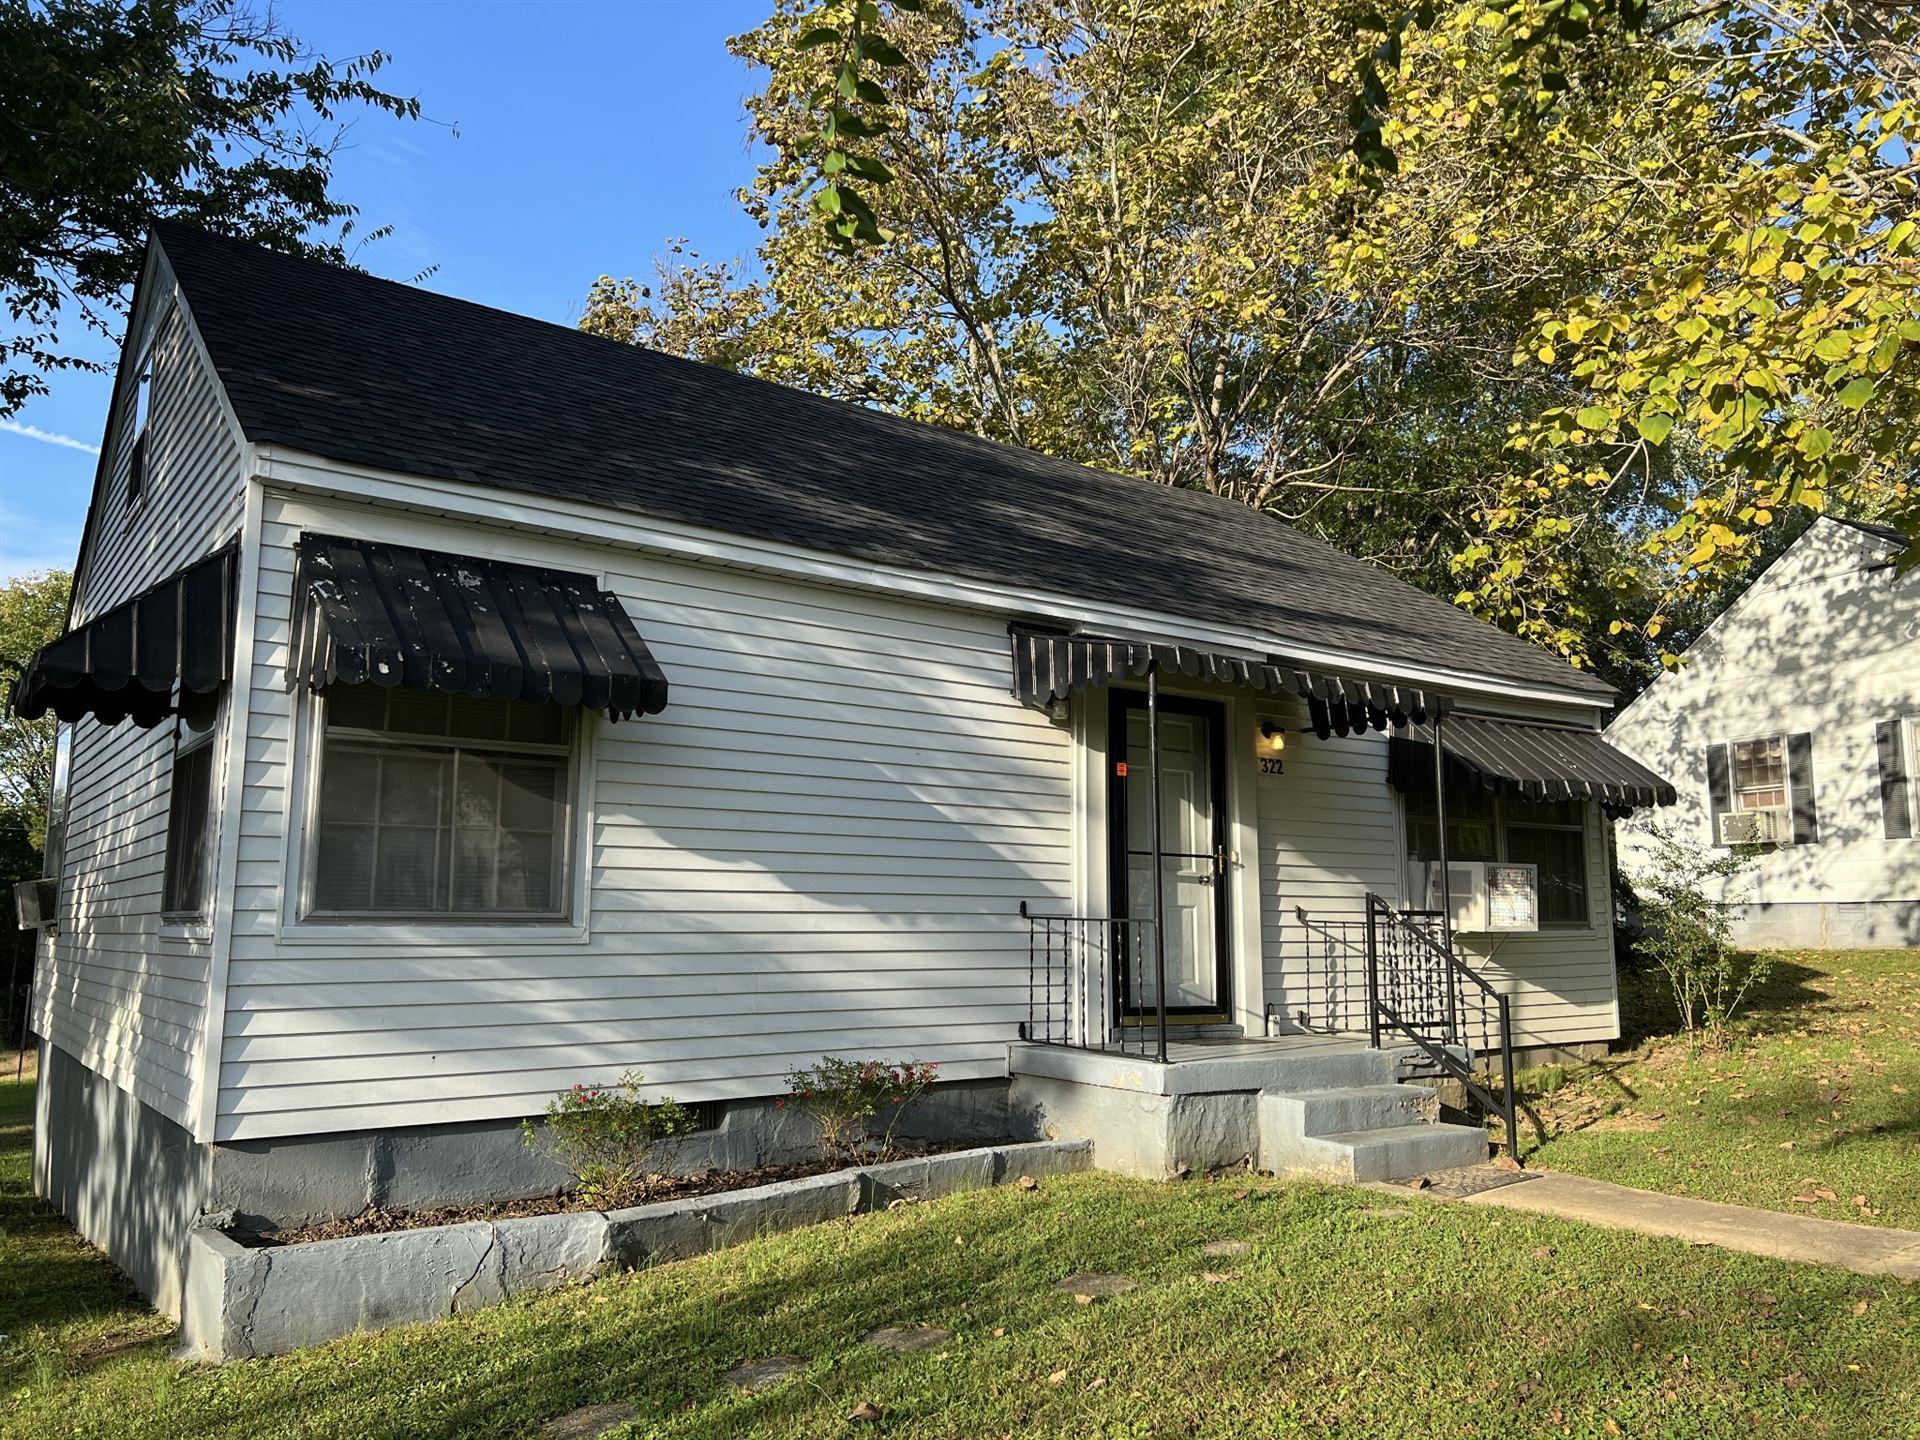 Photo of 322 W Berkley Cir, Lewisburg, TN 37091 (MLS # 2300562)